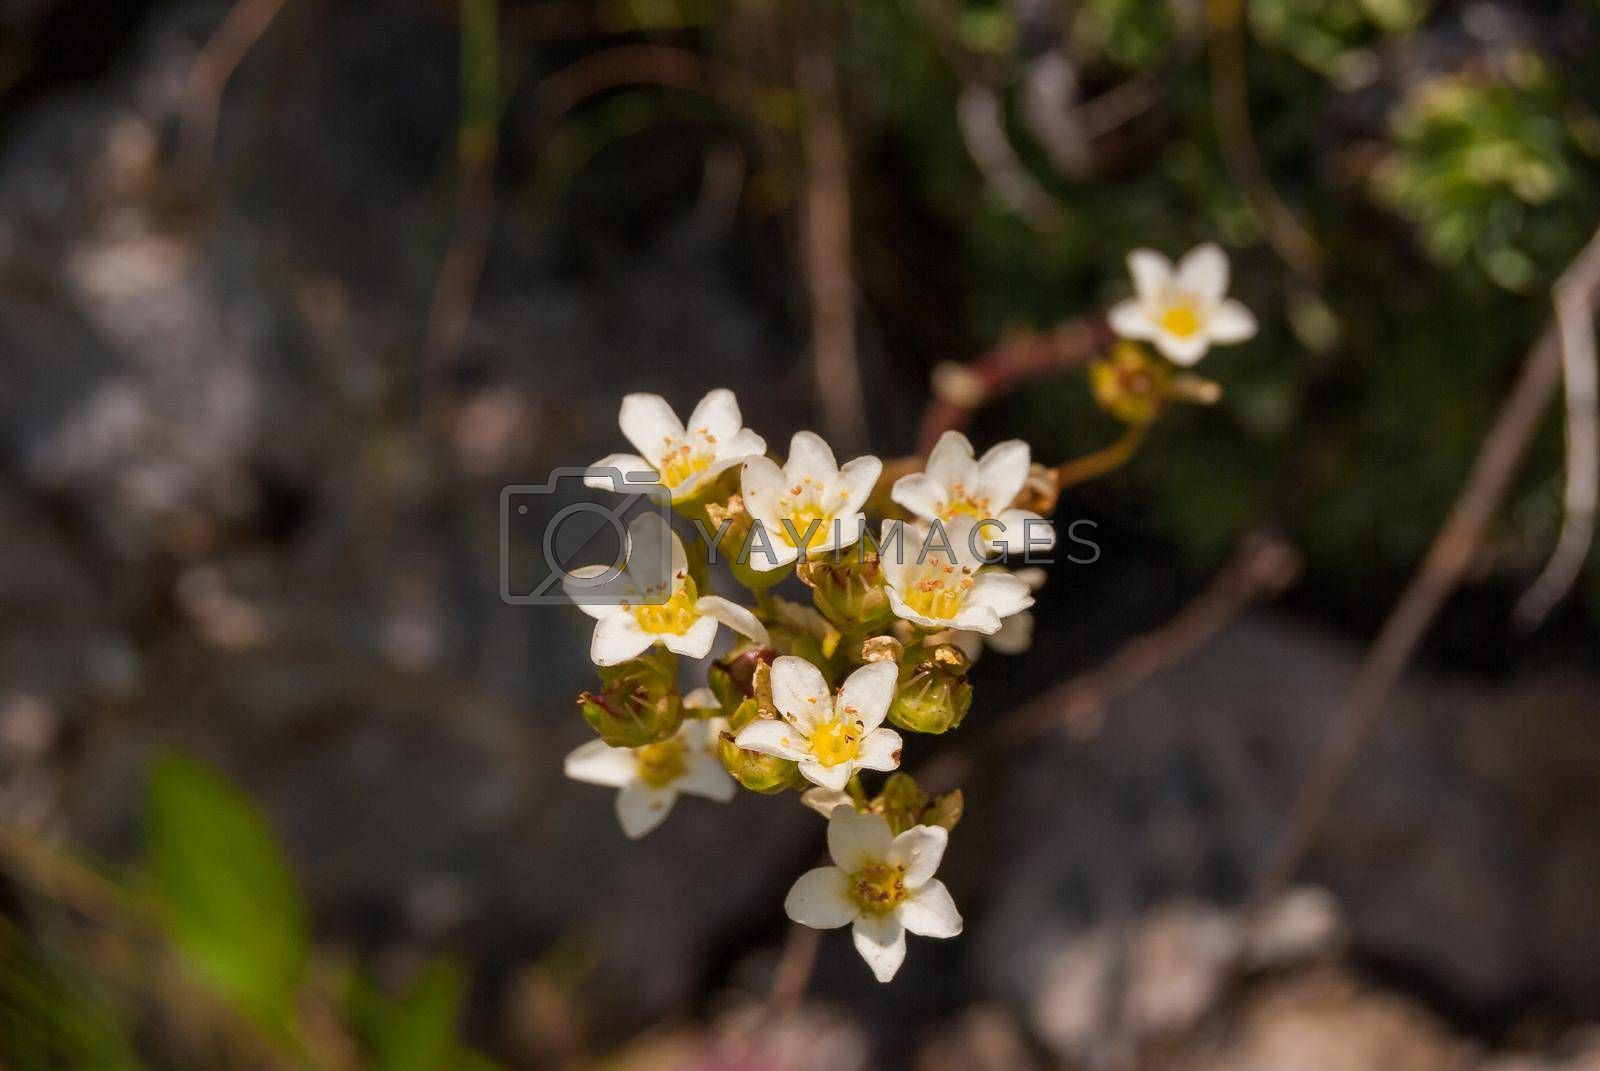 Saxifrage paniculate flowers grow on an Alpine meadow.